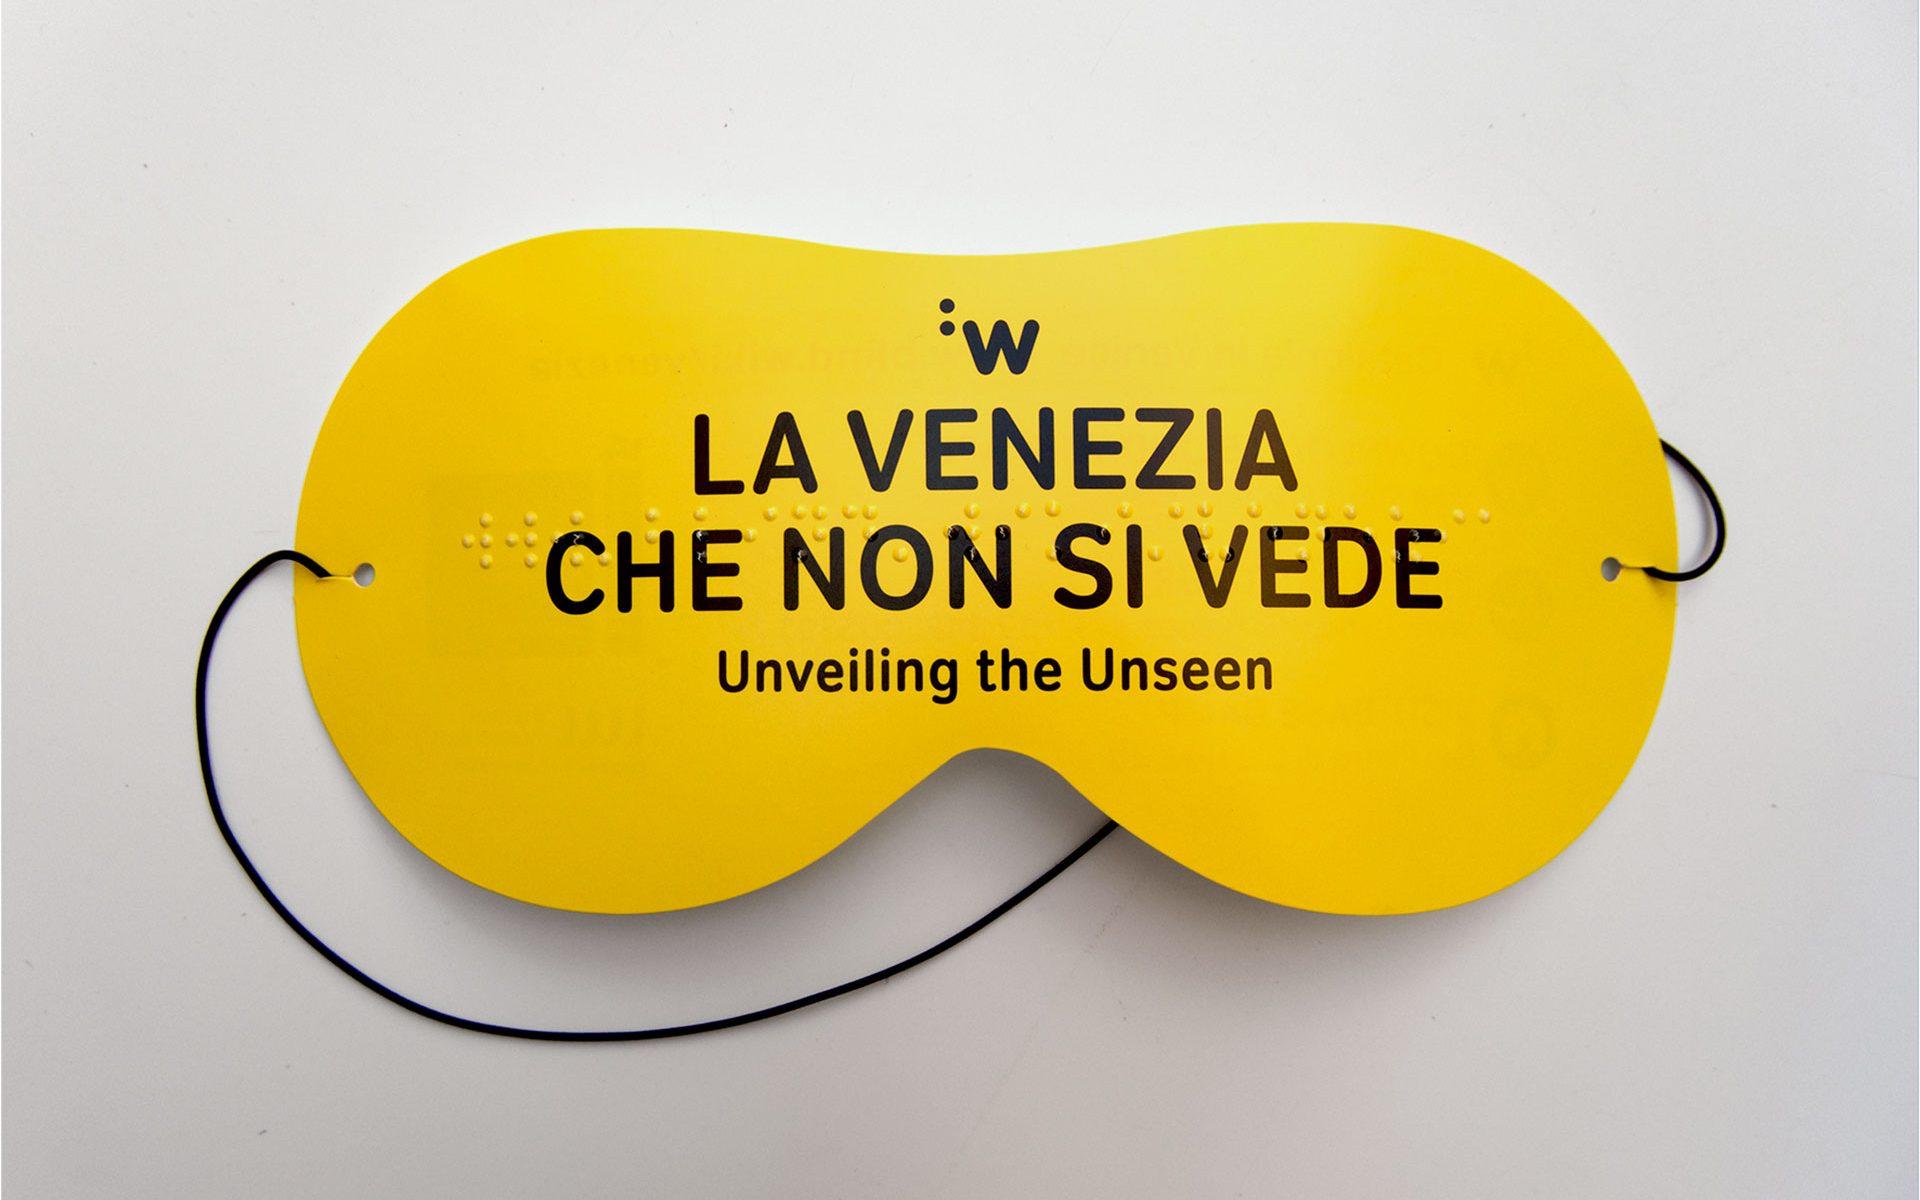 Antifaz promocional impreso en braille